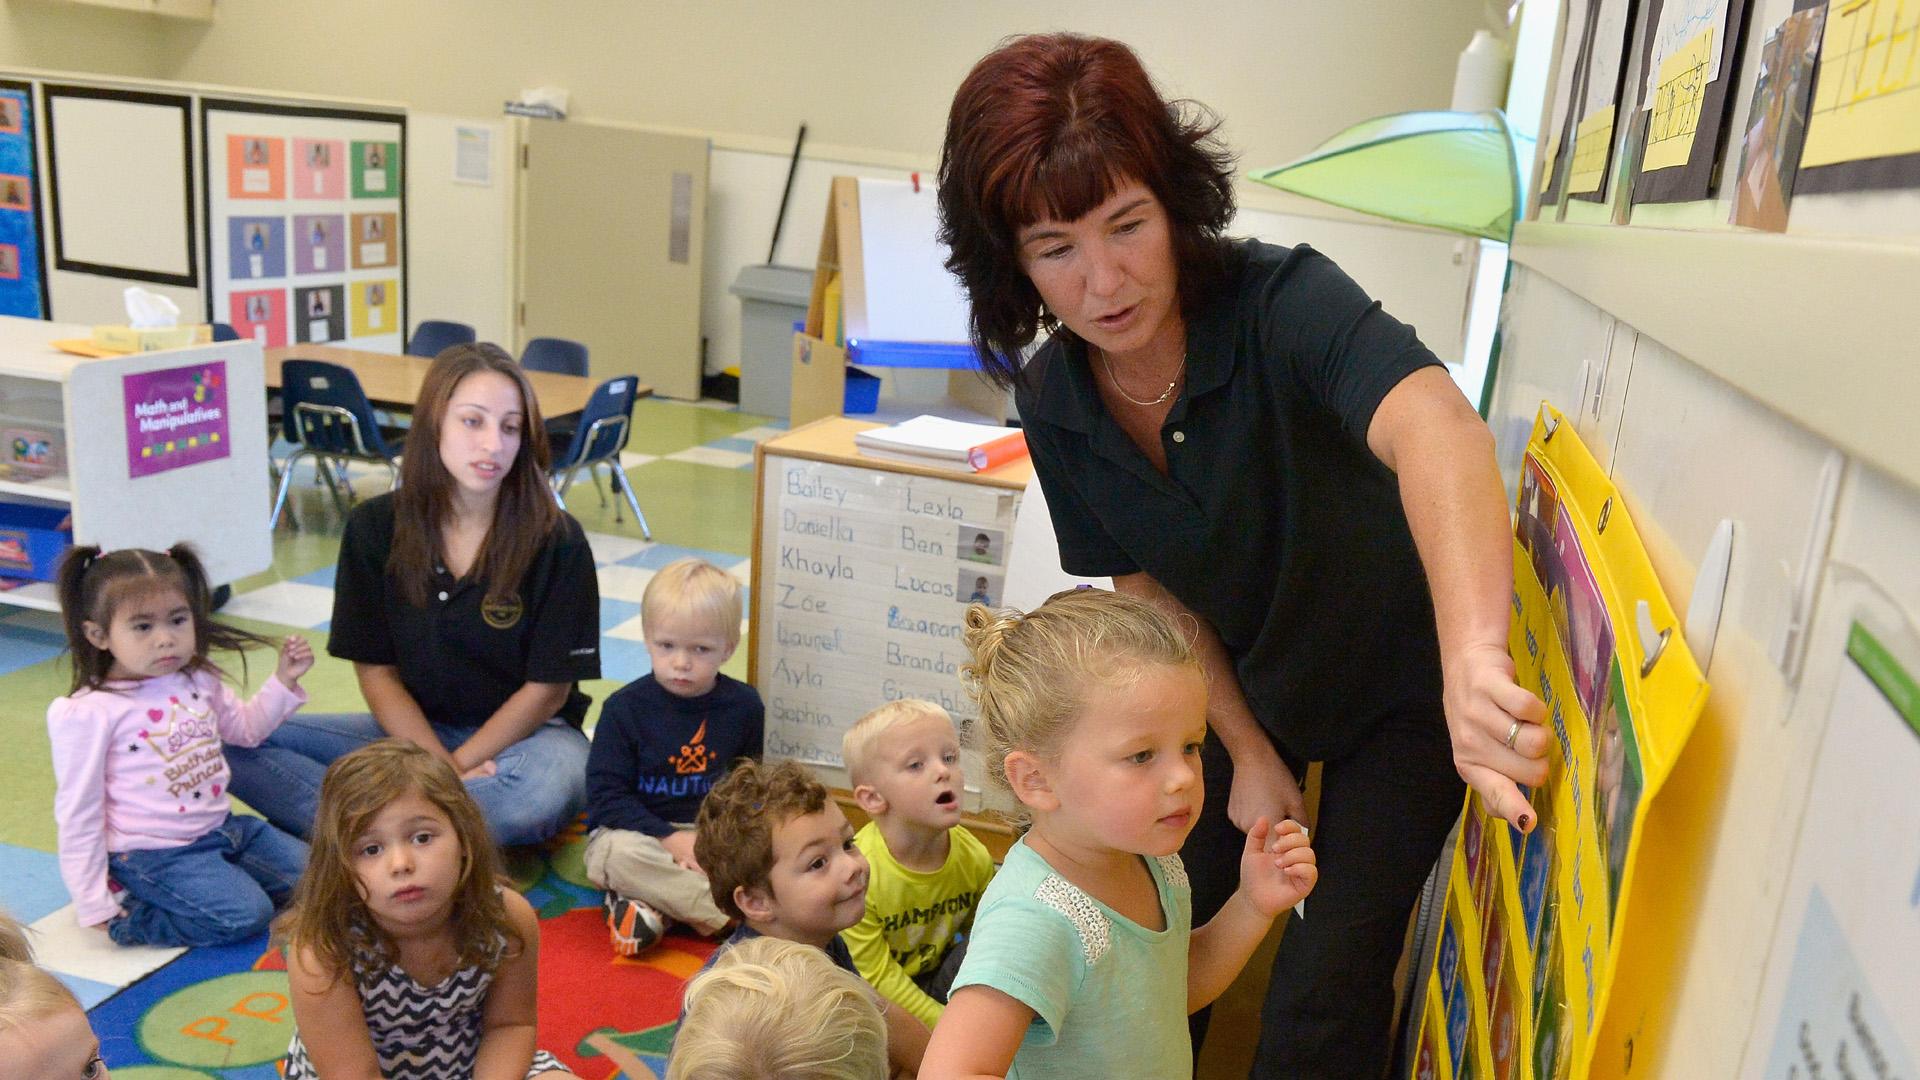 Teachers, pre-school, KinderCare, students, children, classroom86085702-159532